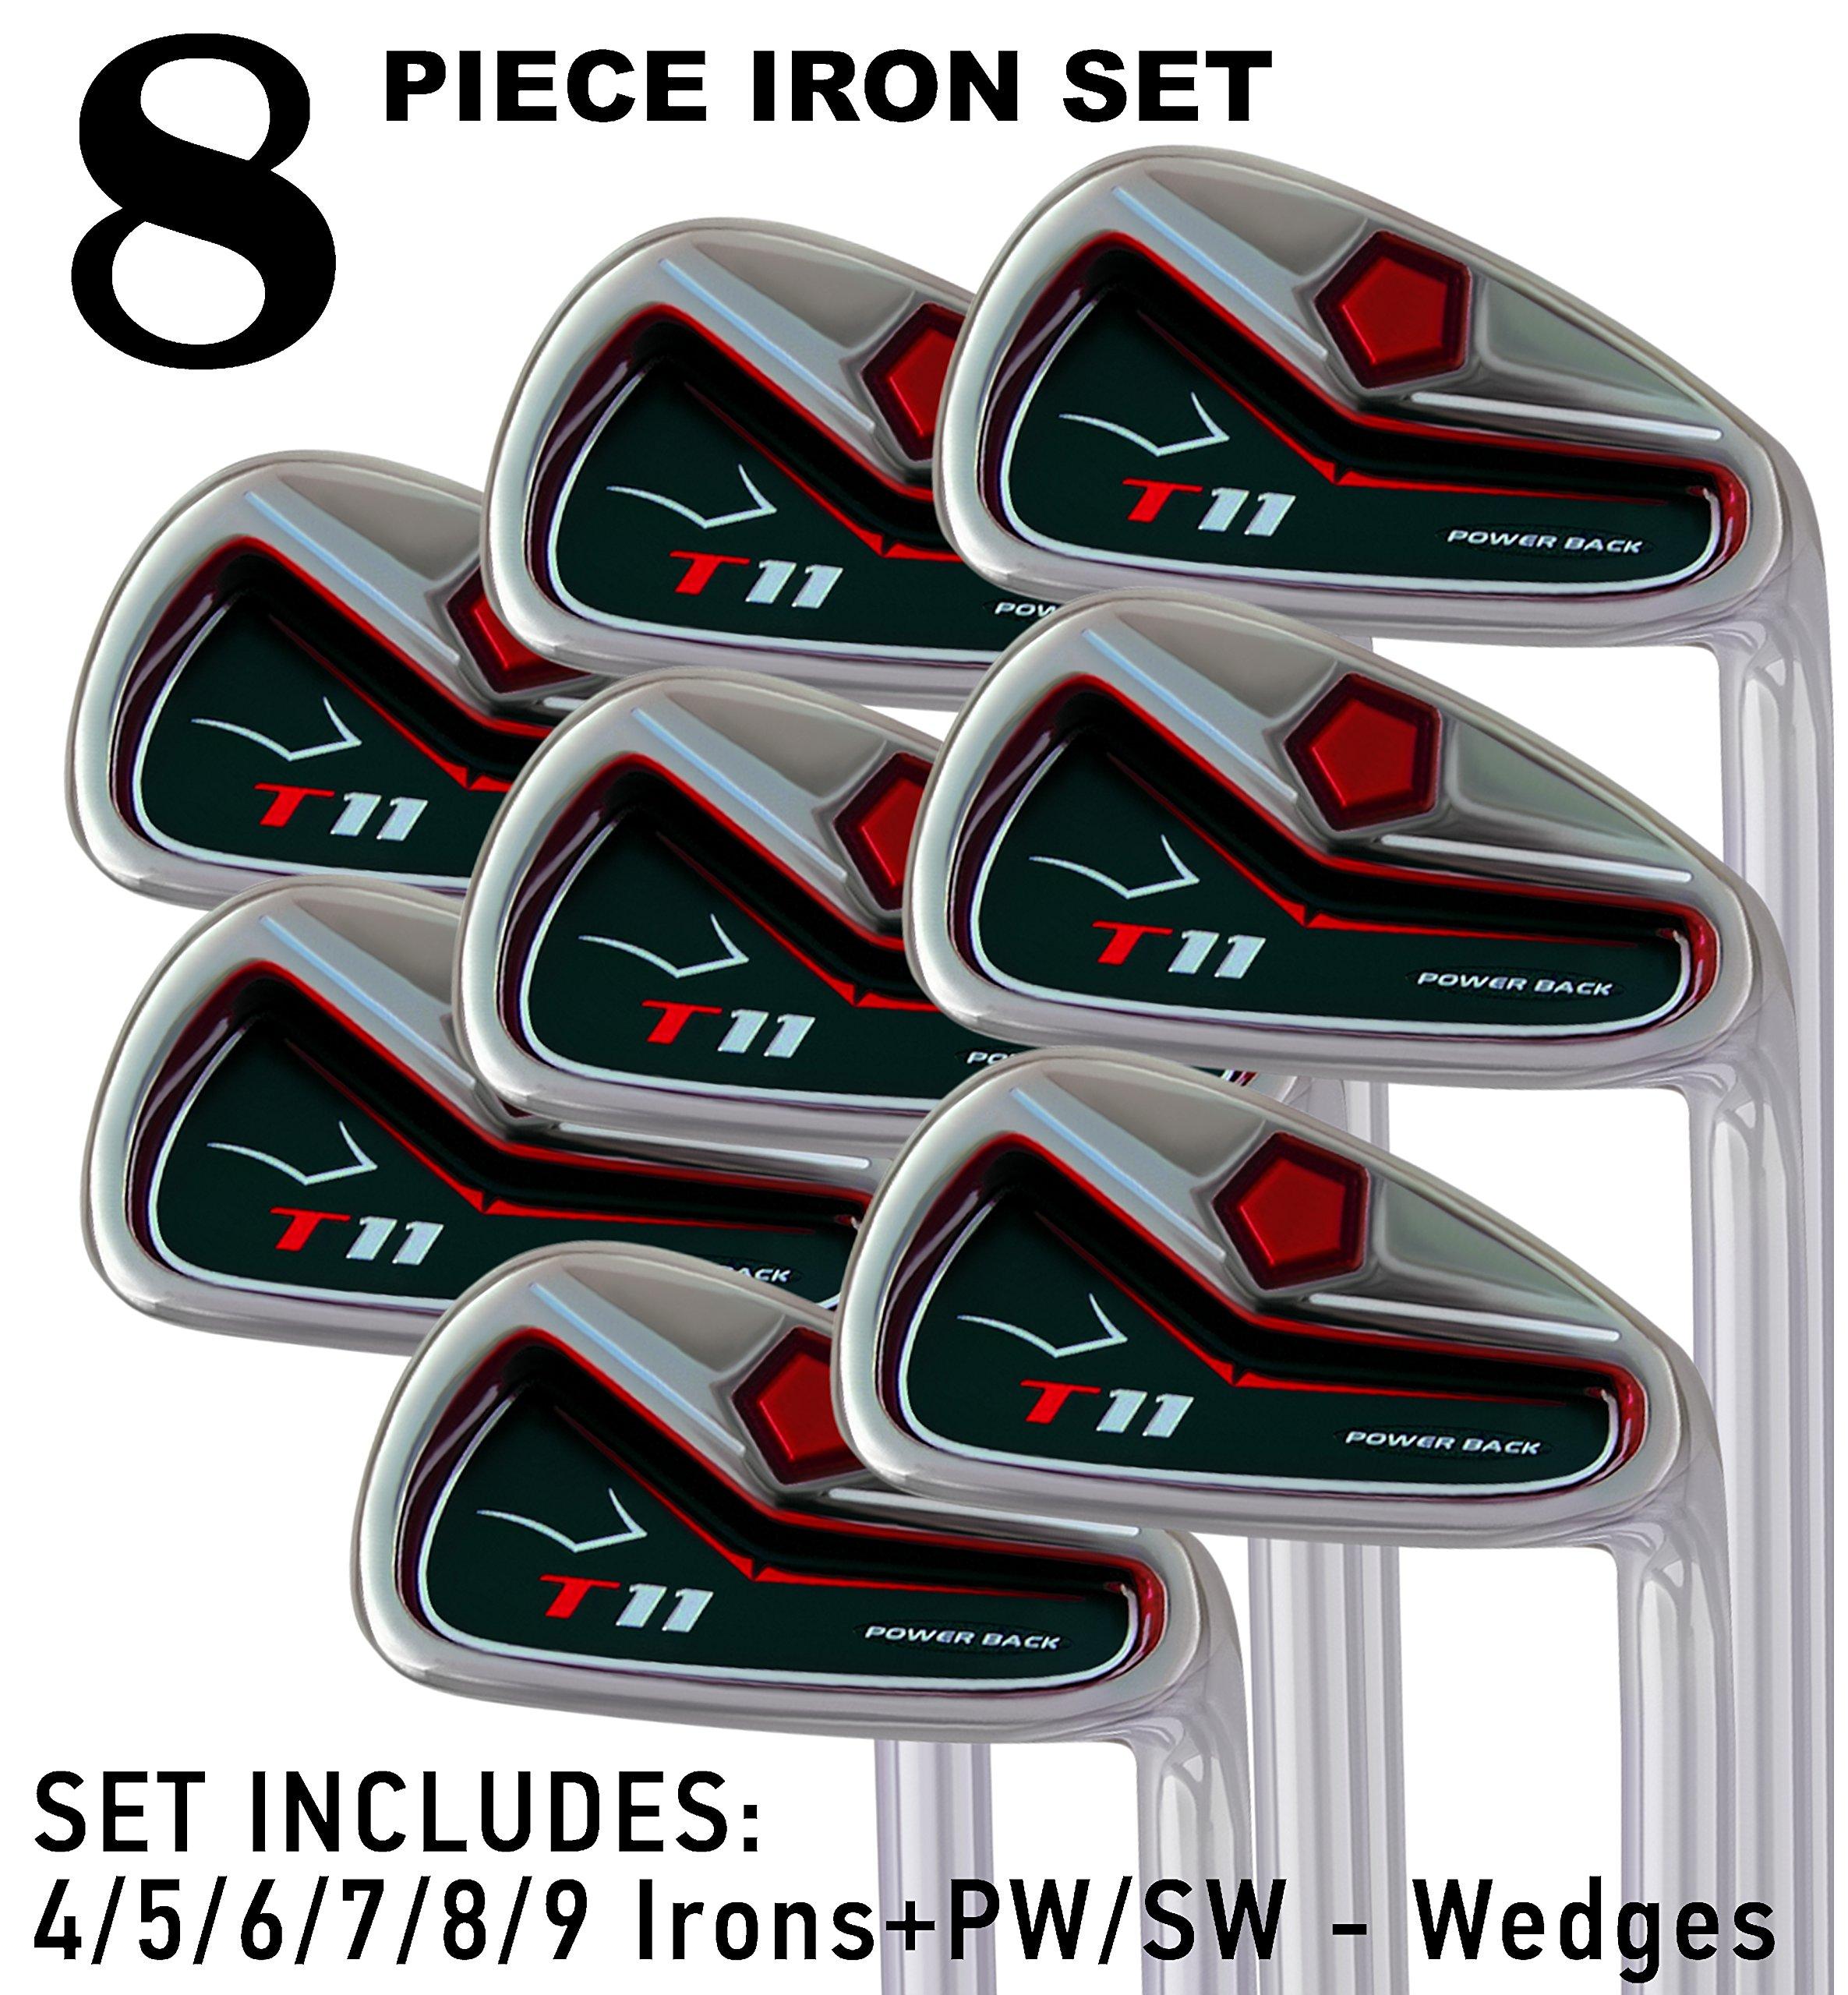 Power Back T11 Iron Set 4-SW Custom Made Golf Clubs Right Hand Senior Flex Graphite Shafts Men's Standard Irons